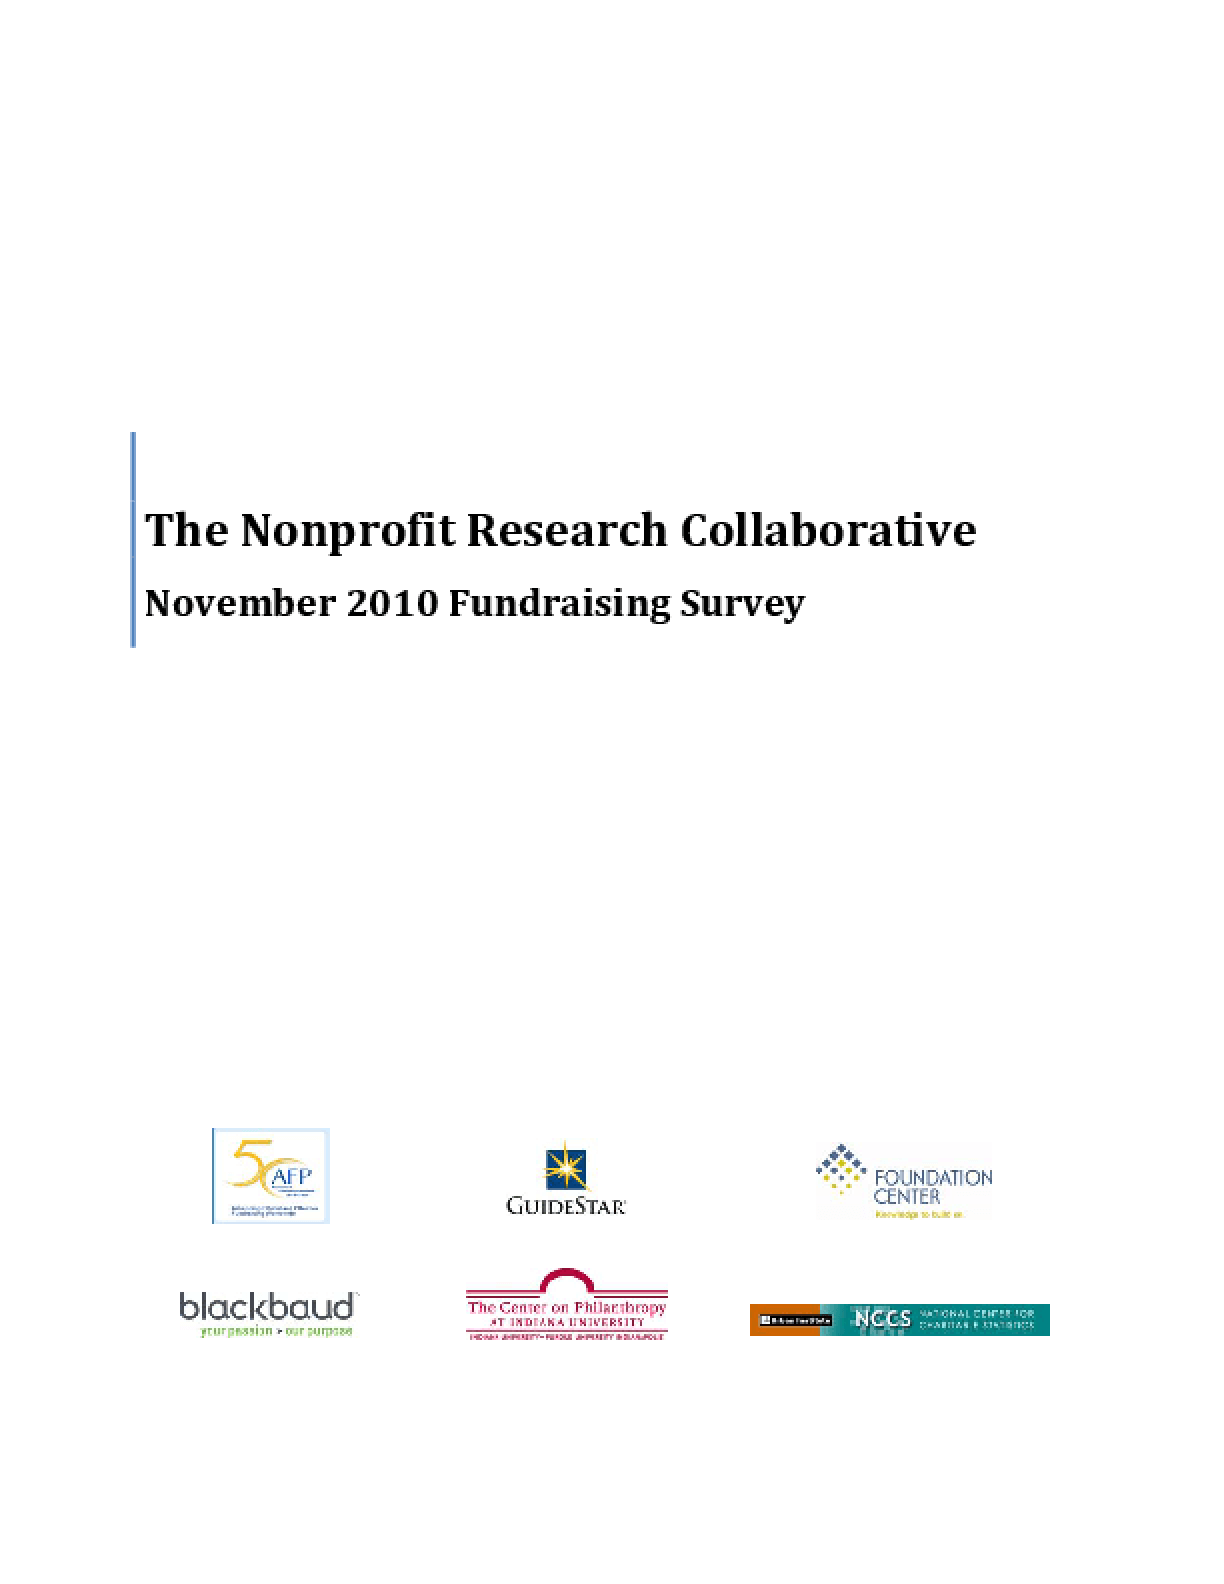 The Nonprofit Fundraising Survey: November 2010